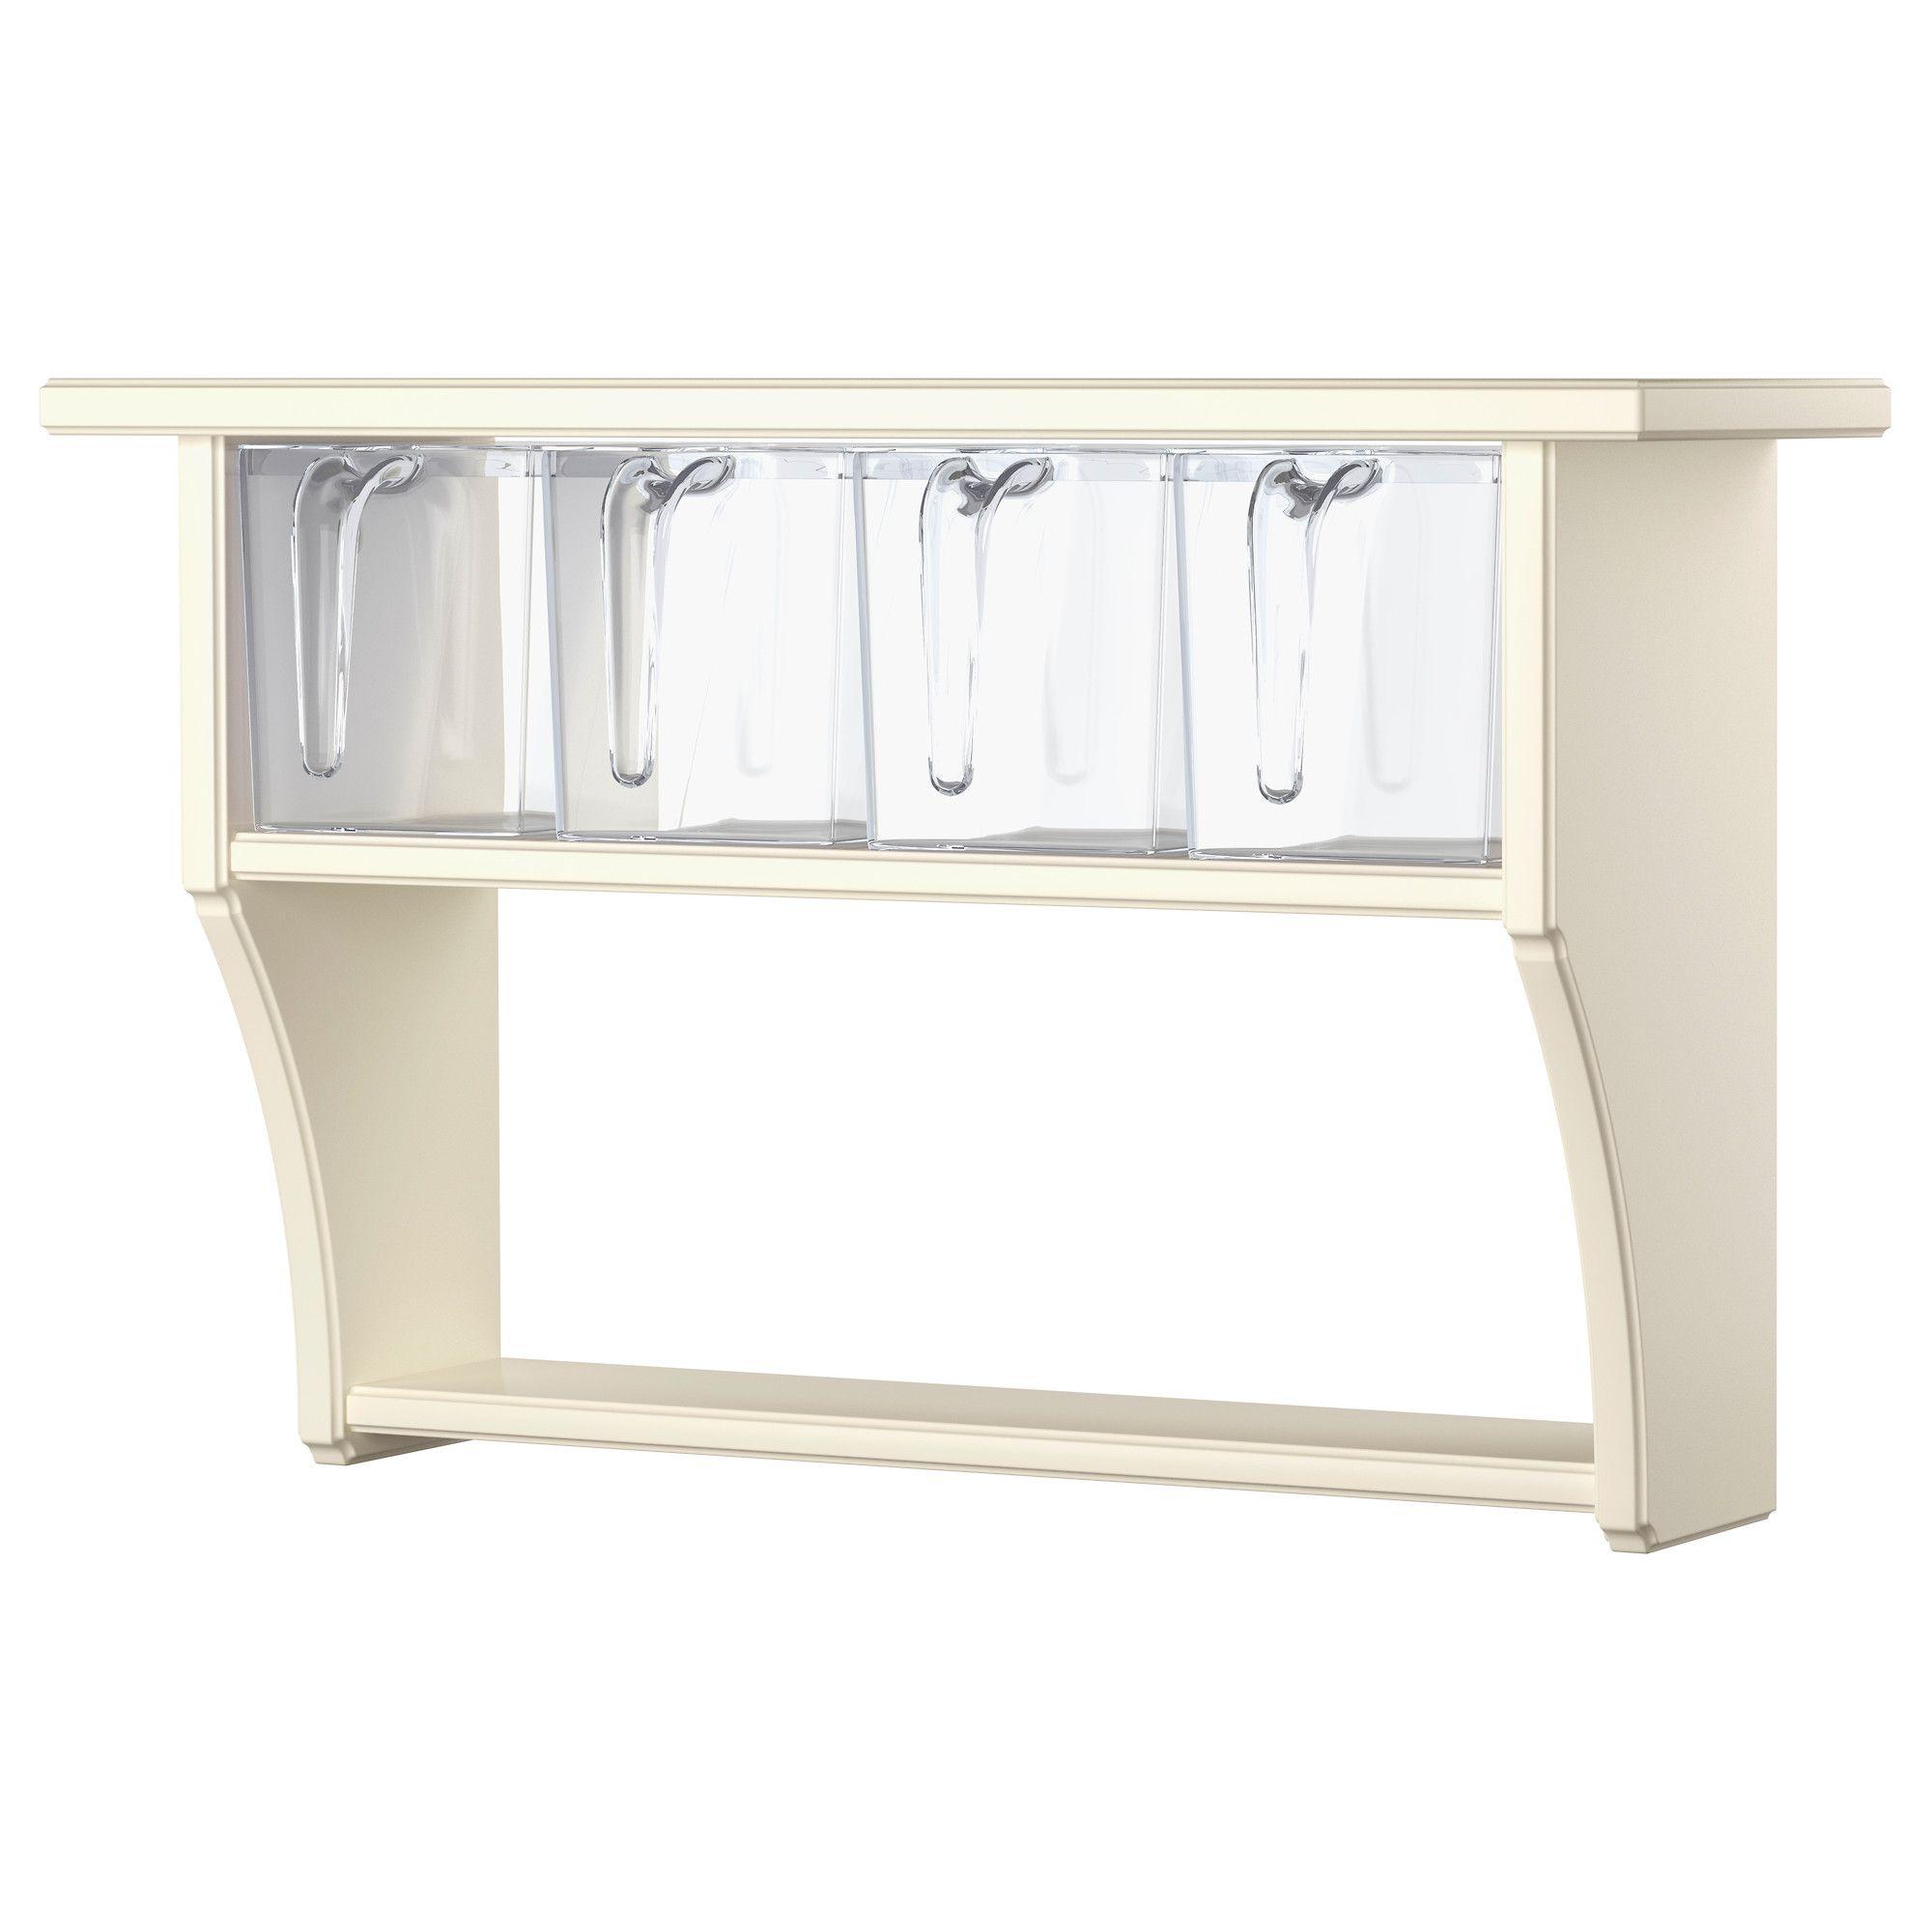 Favori STENSTORP Étagère murale avec tiroirs, blanc | Cassetti, Ikea e  RW81